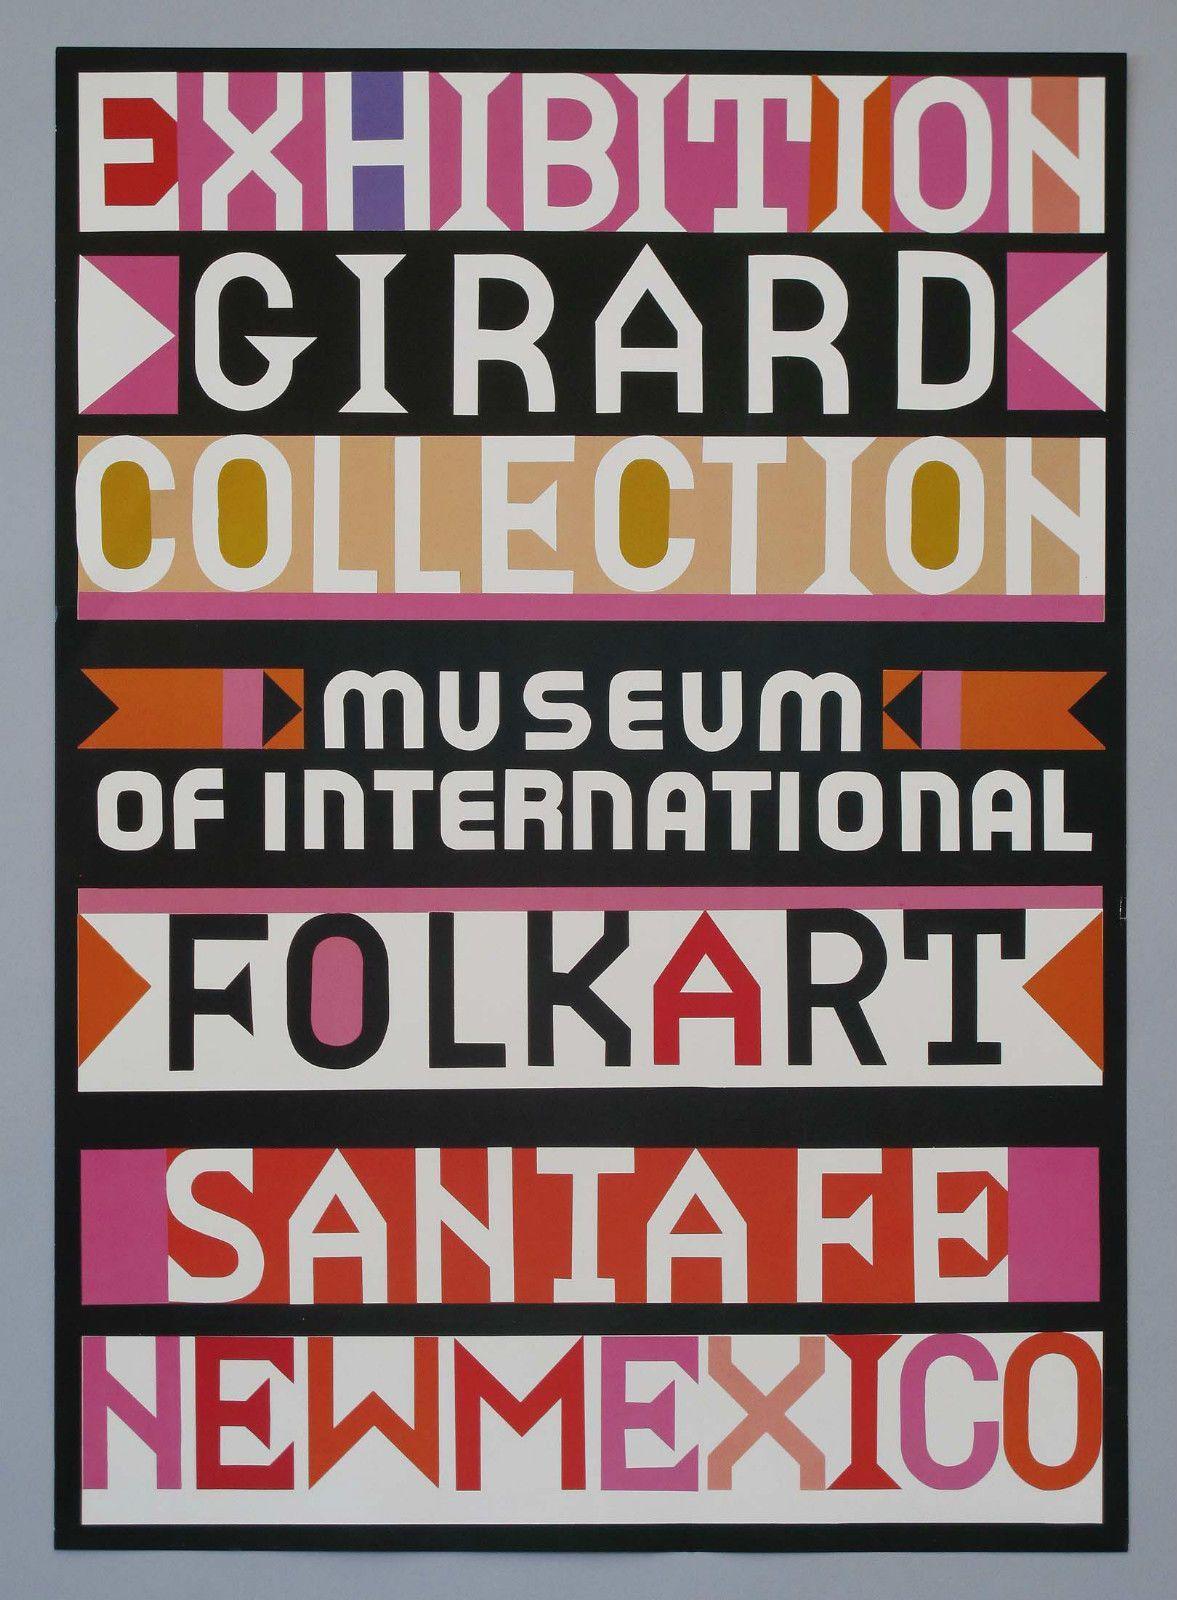 Alexander Girard Girard Collection at The Museum of International Folk Art